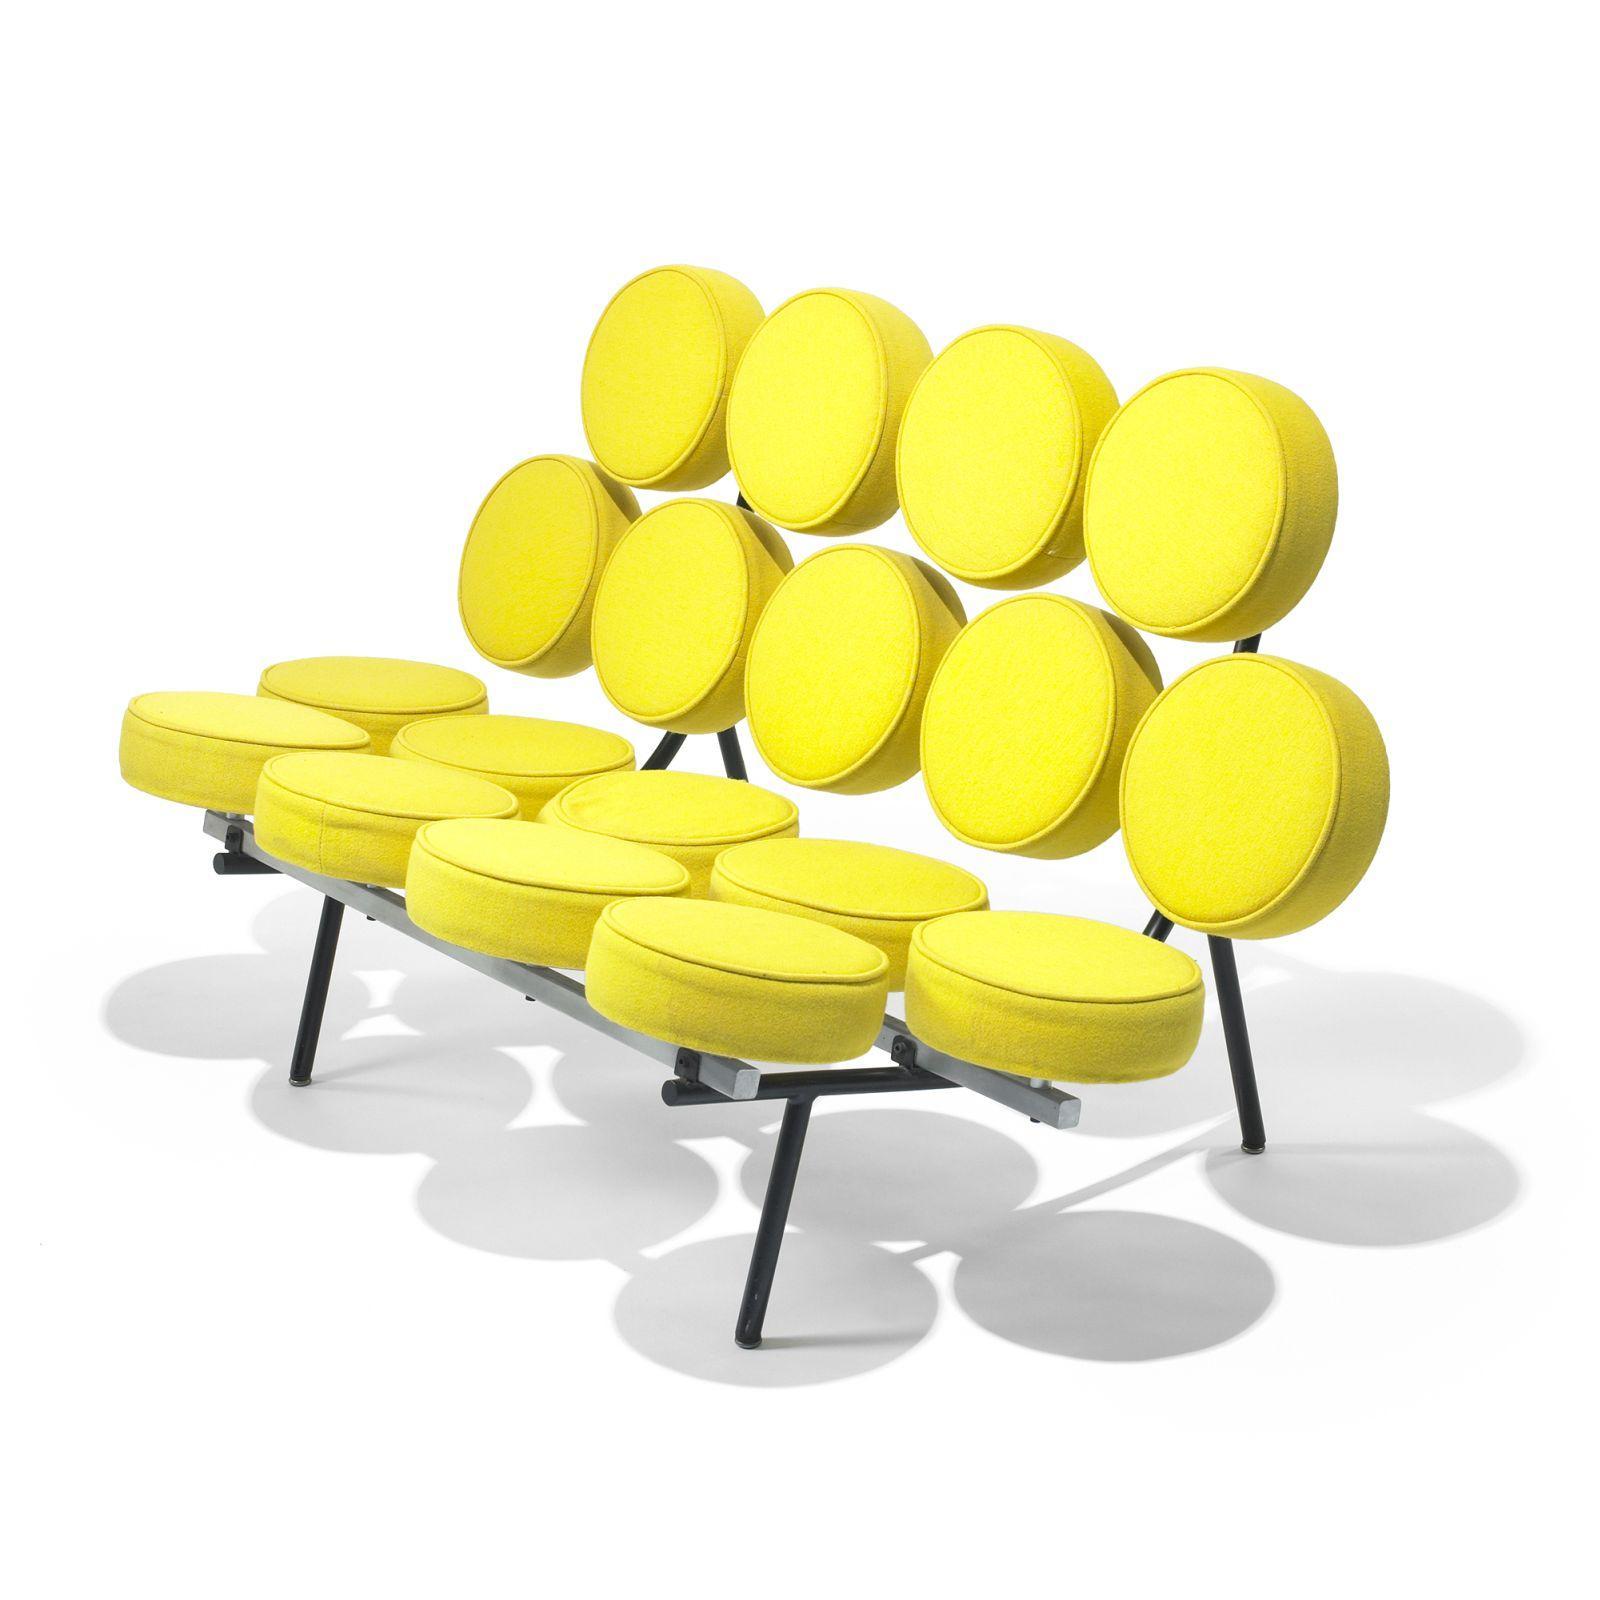 George Nelson & Associates Marshmallow sofa model 5670